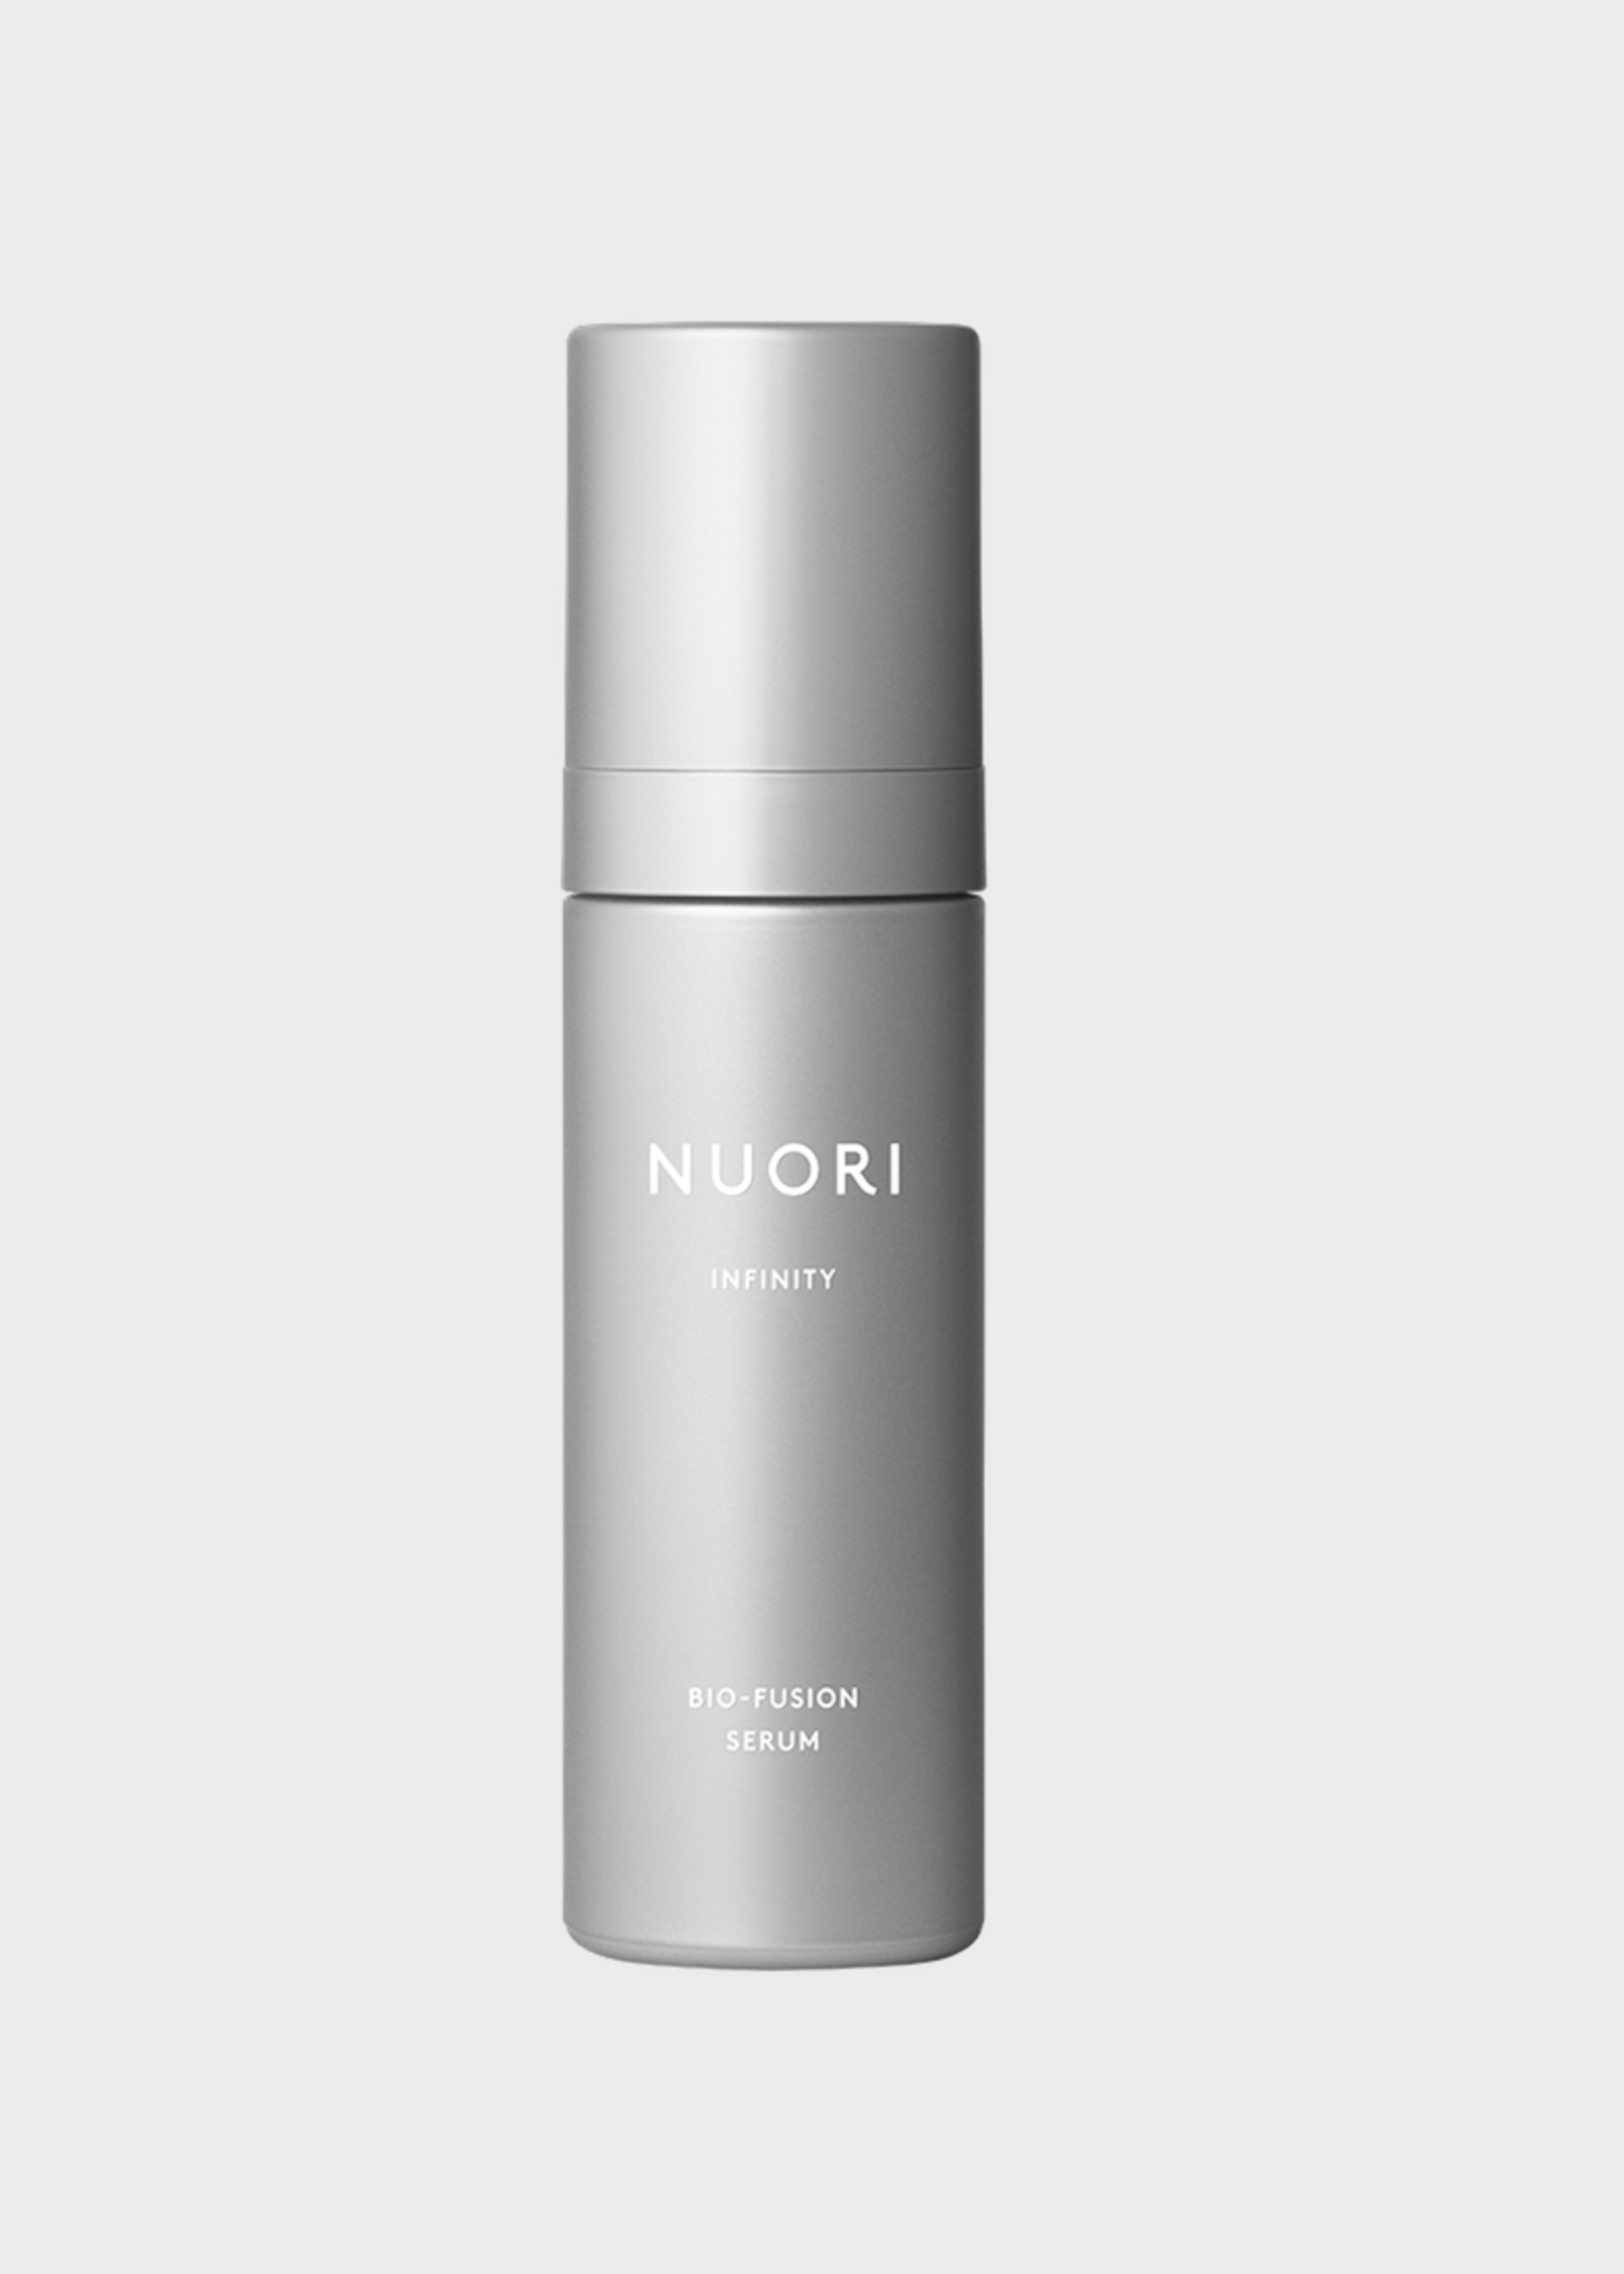 NUORI Bio-Fusion Face Serum 30ml